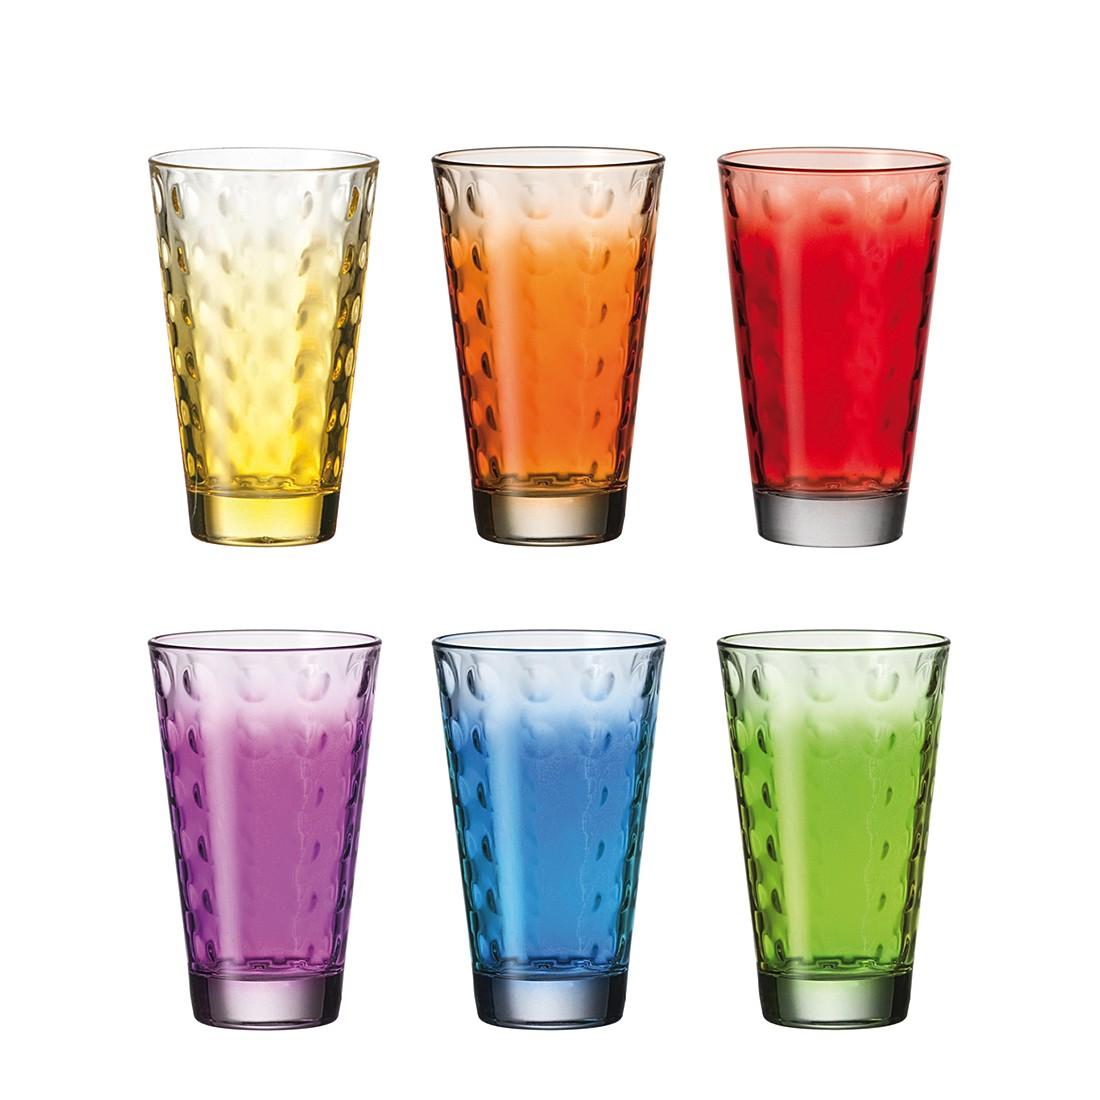 Becher optic 6er set gro farbig sortiert leonardo for Deckenleuchten farbig